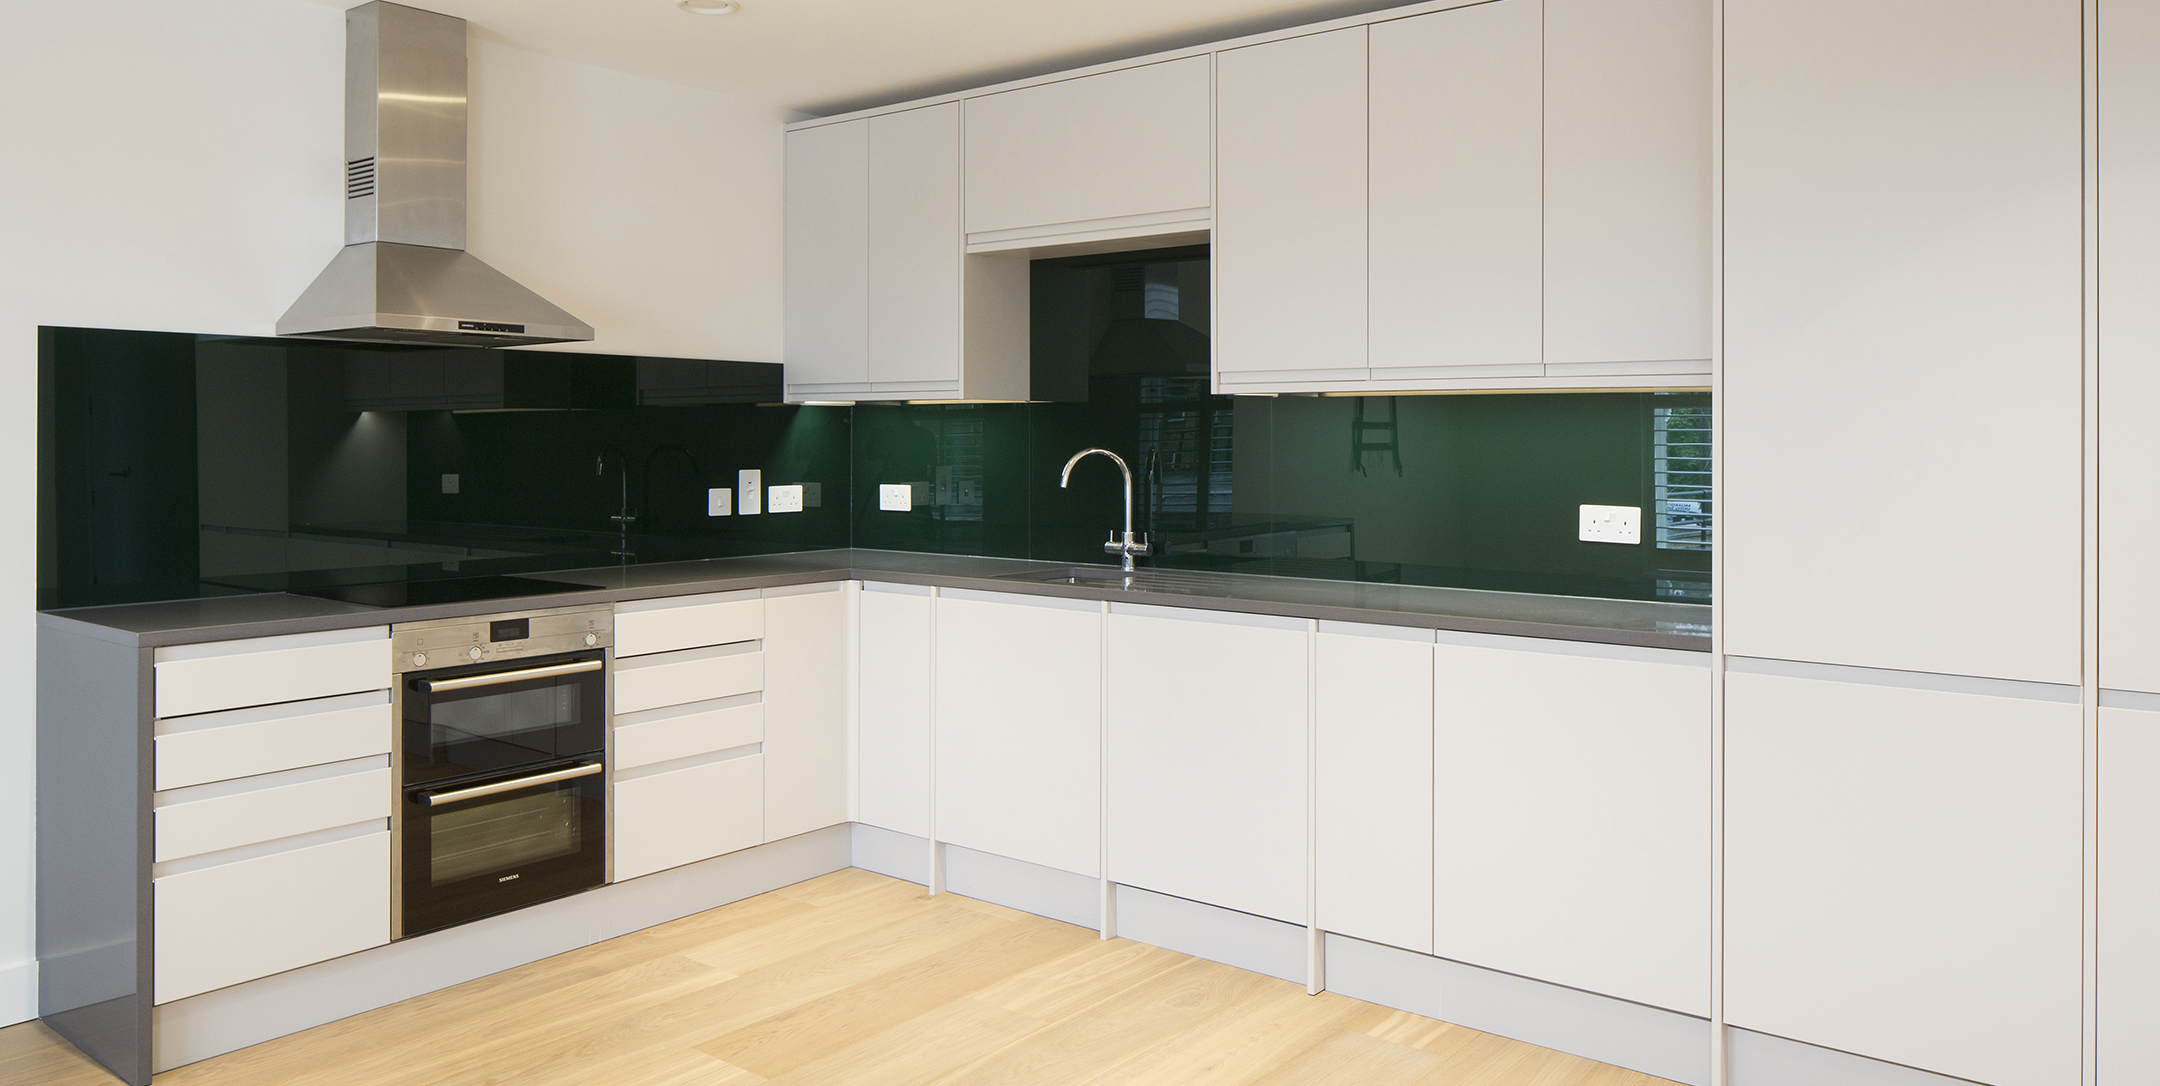 Home Refurbishments Notting Hill - Ashville Inc